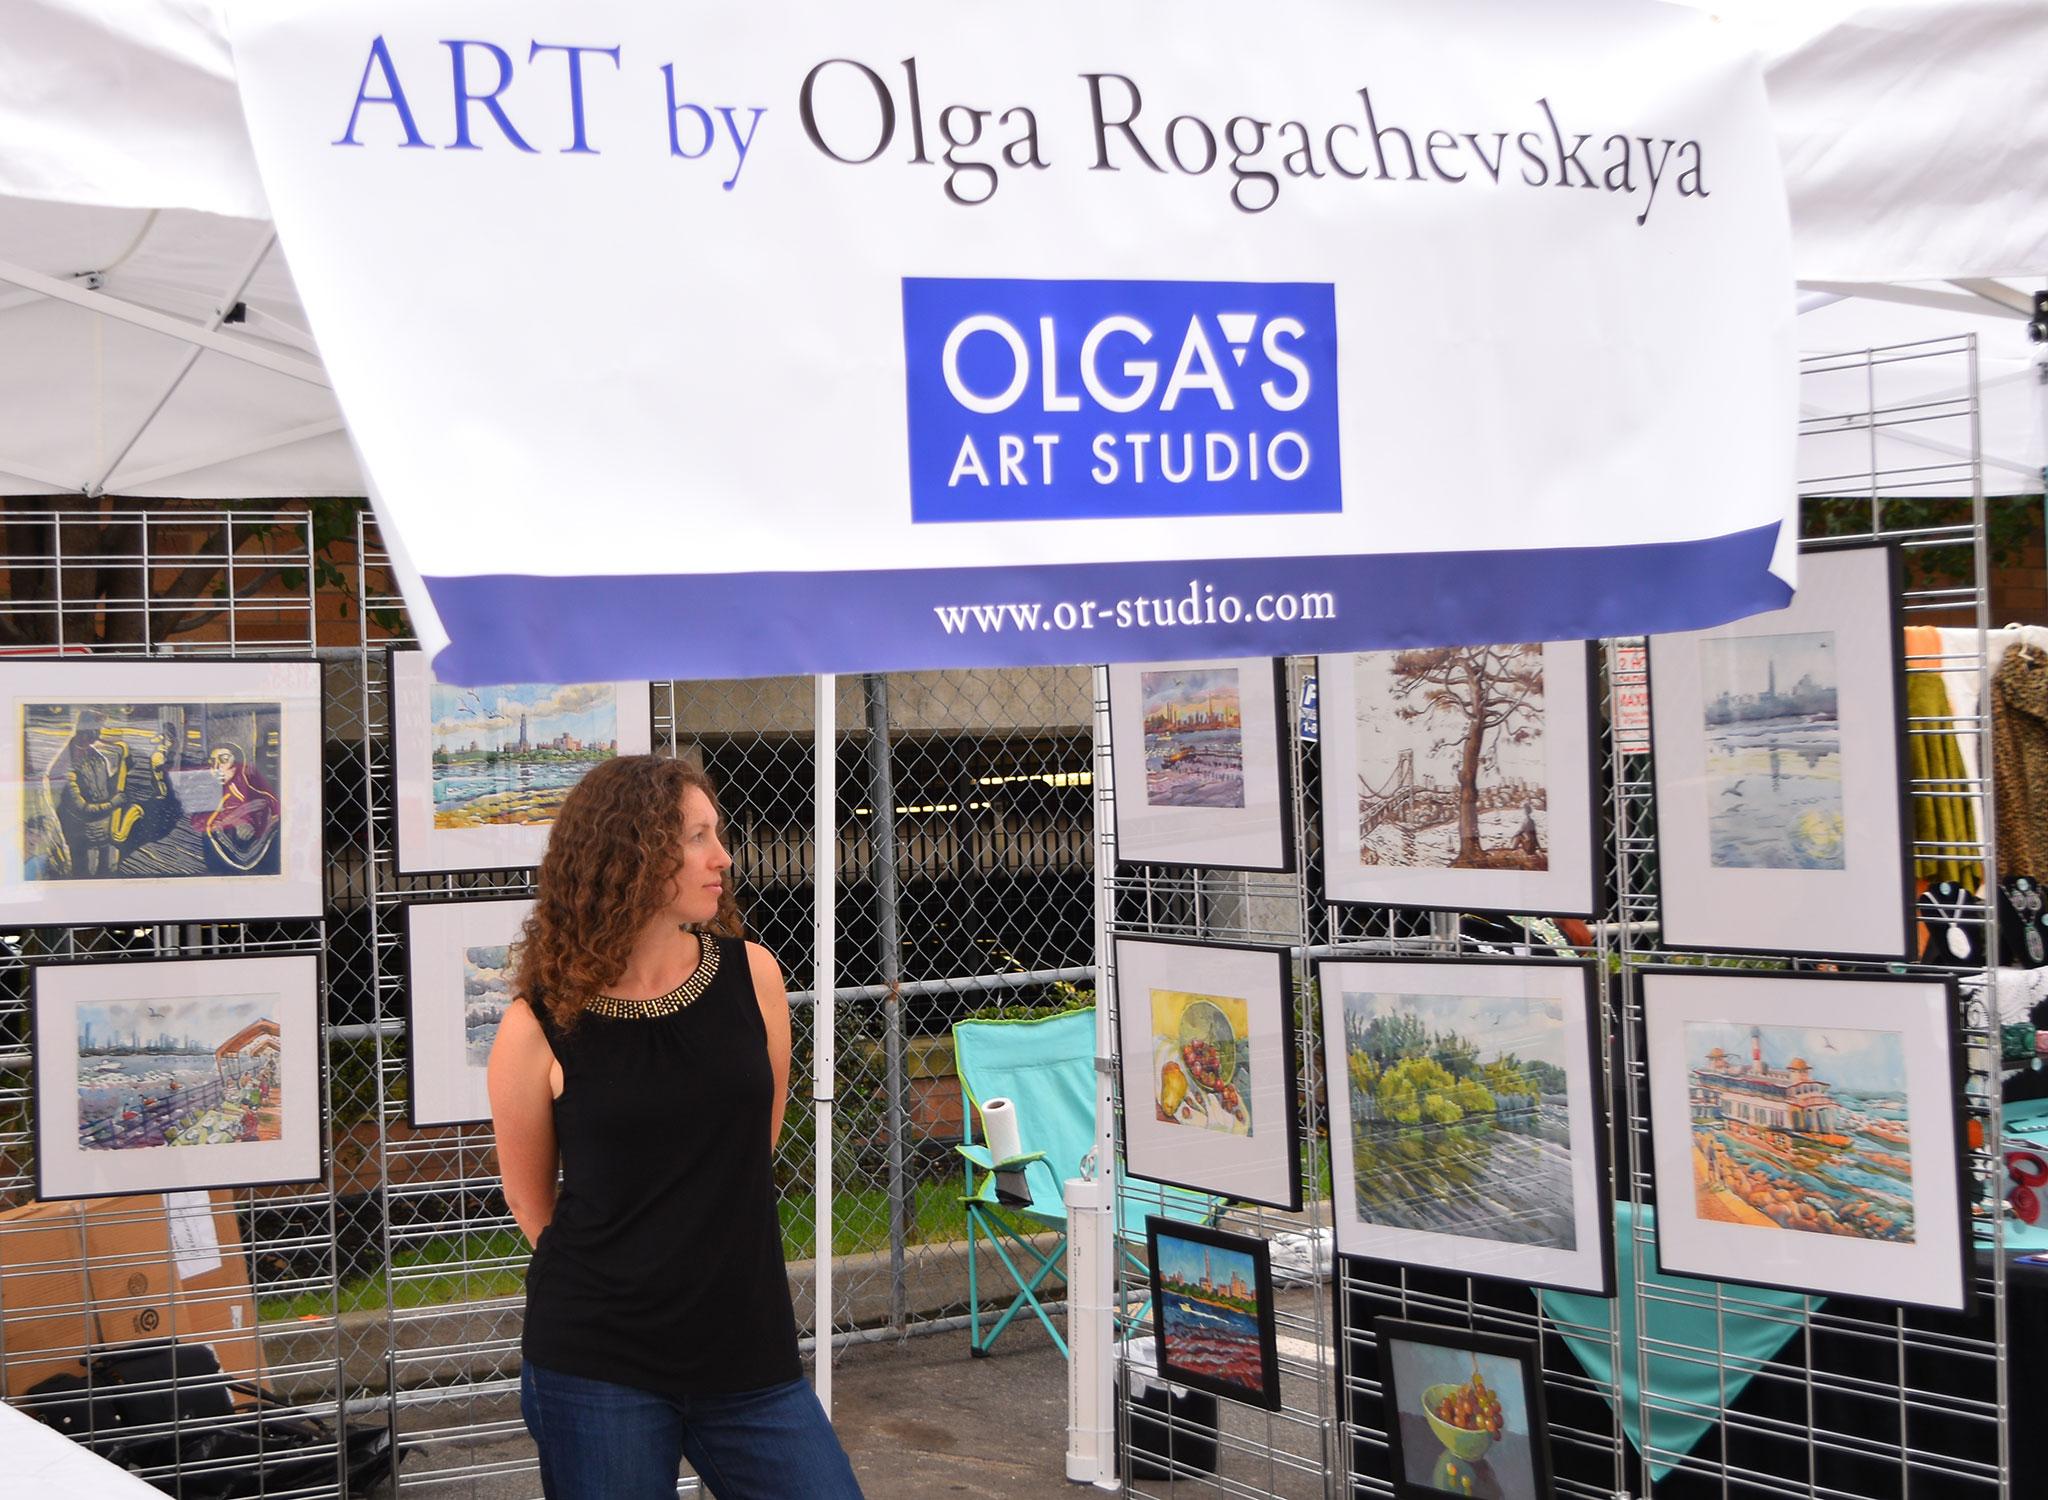 2015 Edgewater Art Festival - Olga Rogachevskaya's art